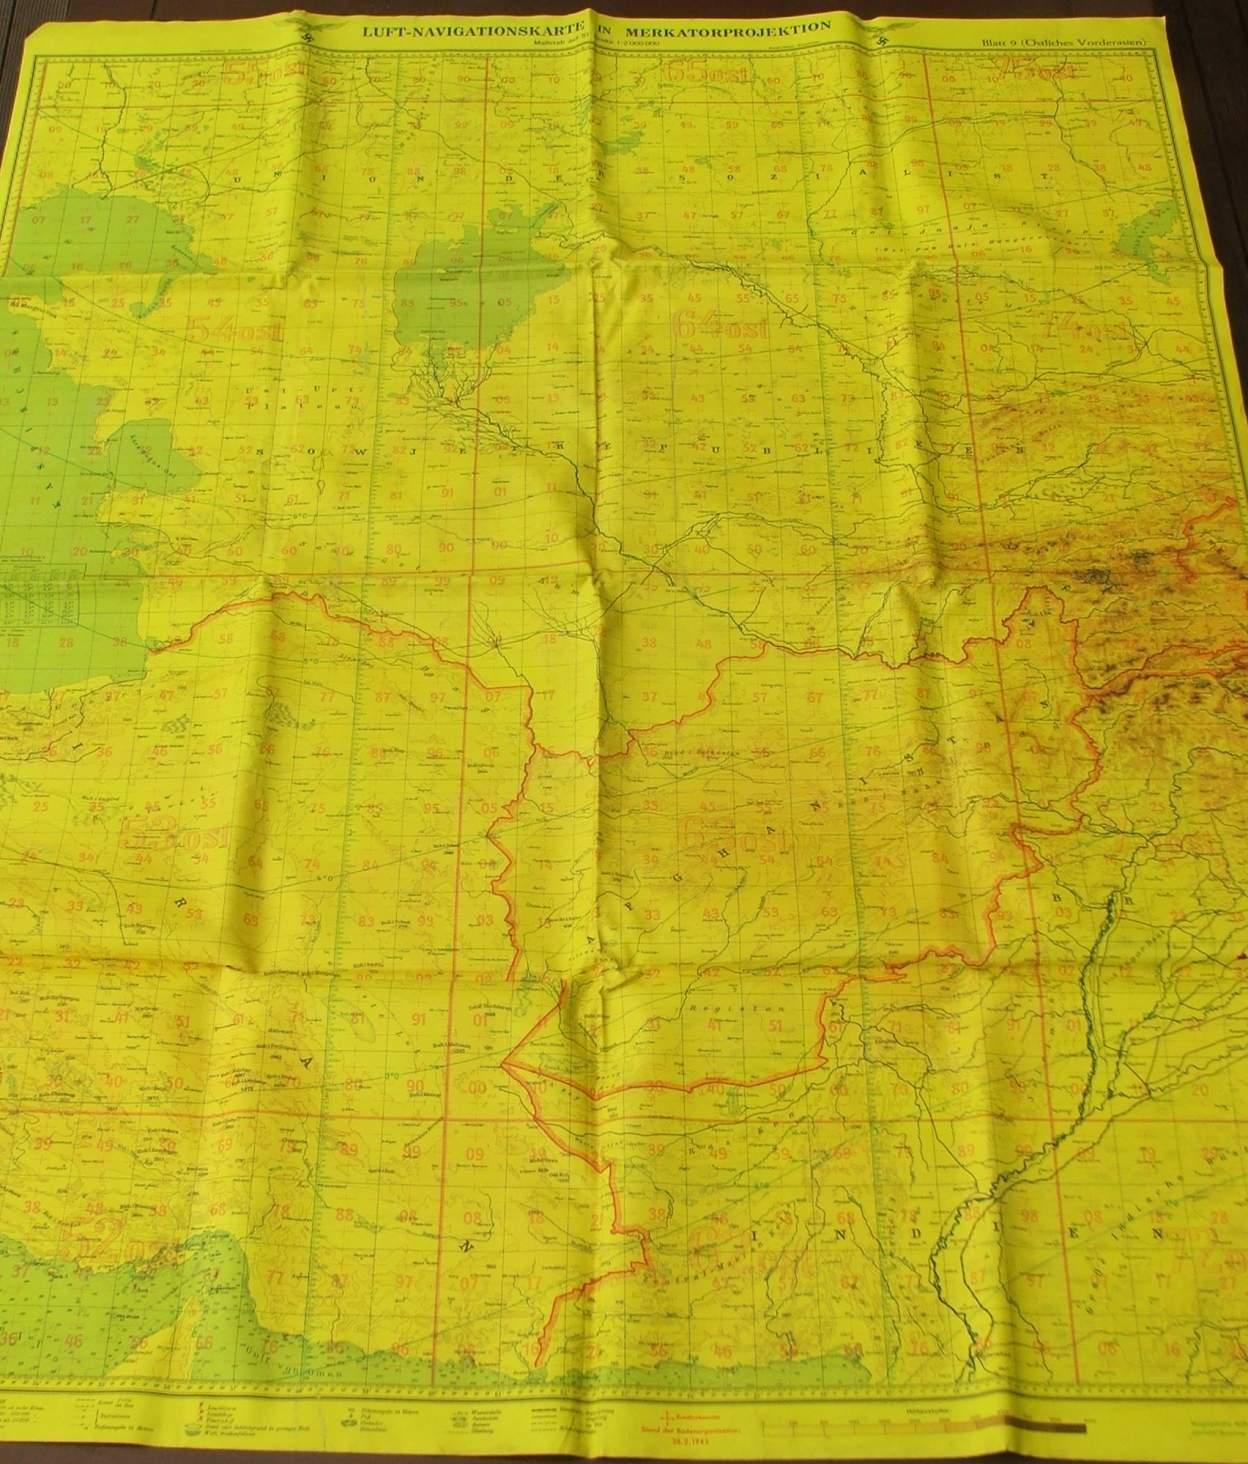 Luftwaffe Night Navigation Flight Map